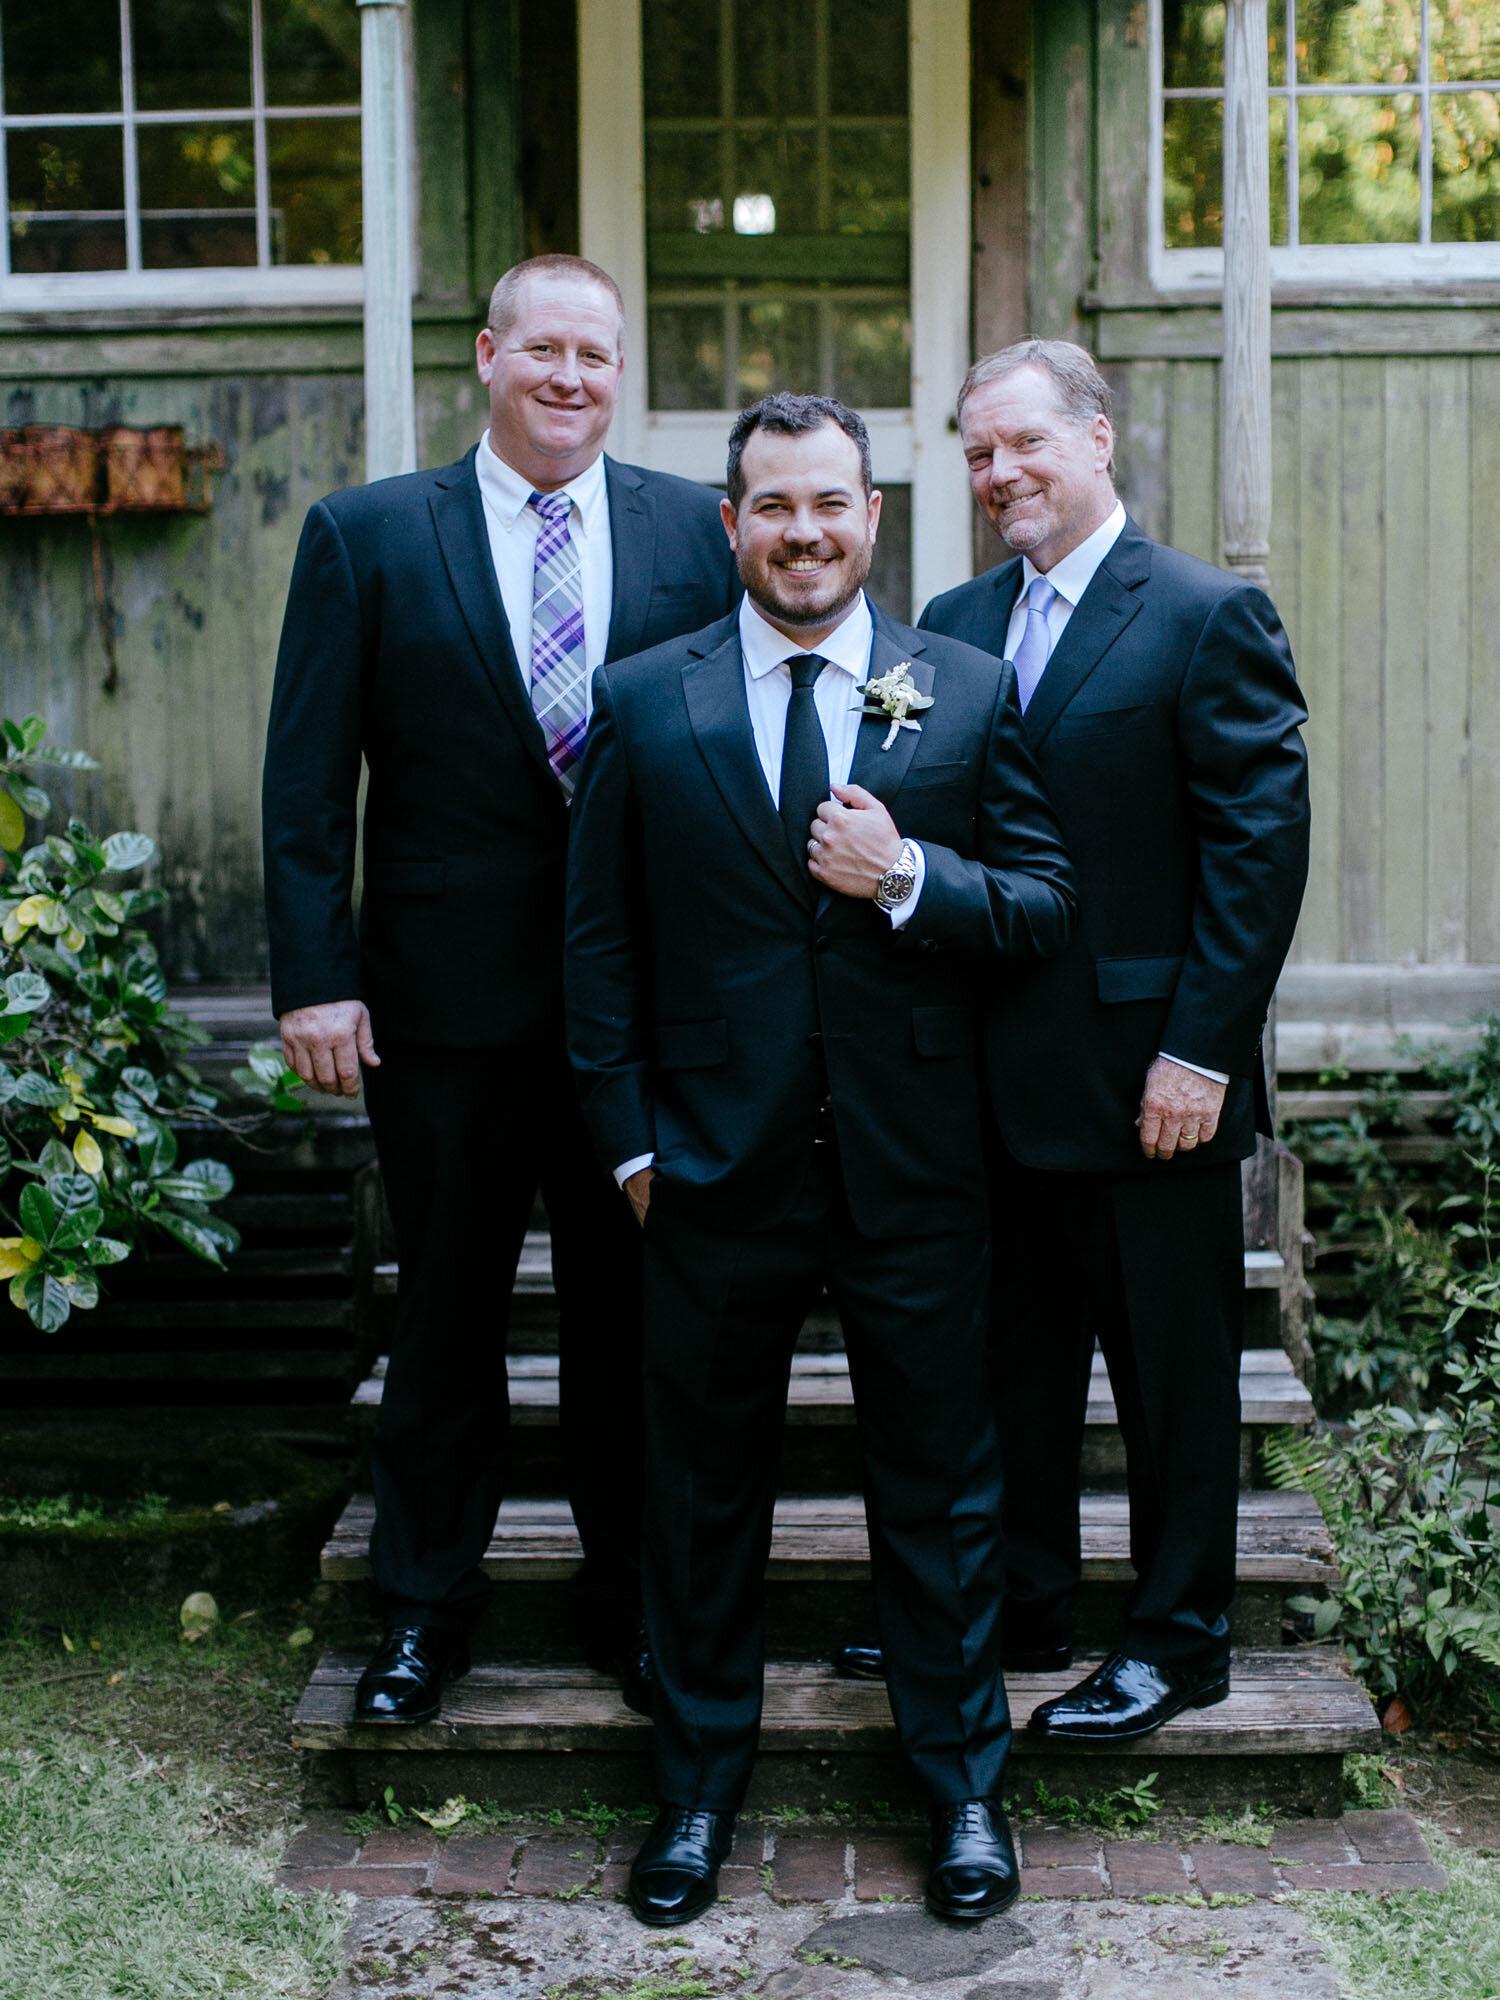 Chris-J-Evans-Maui-Wedding-Kim&Brian3237.jpg